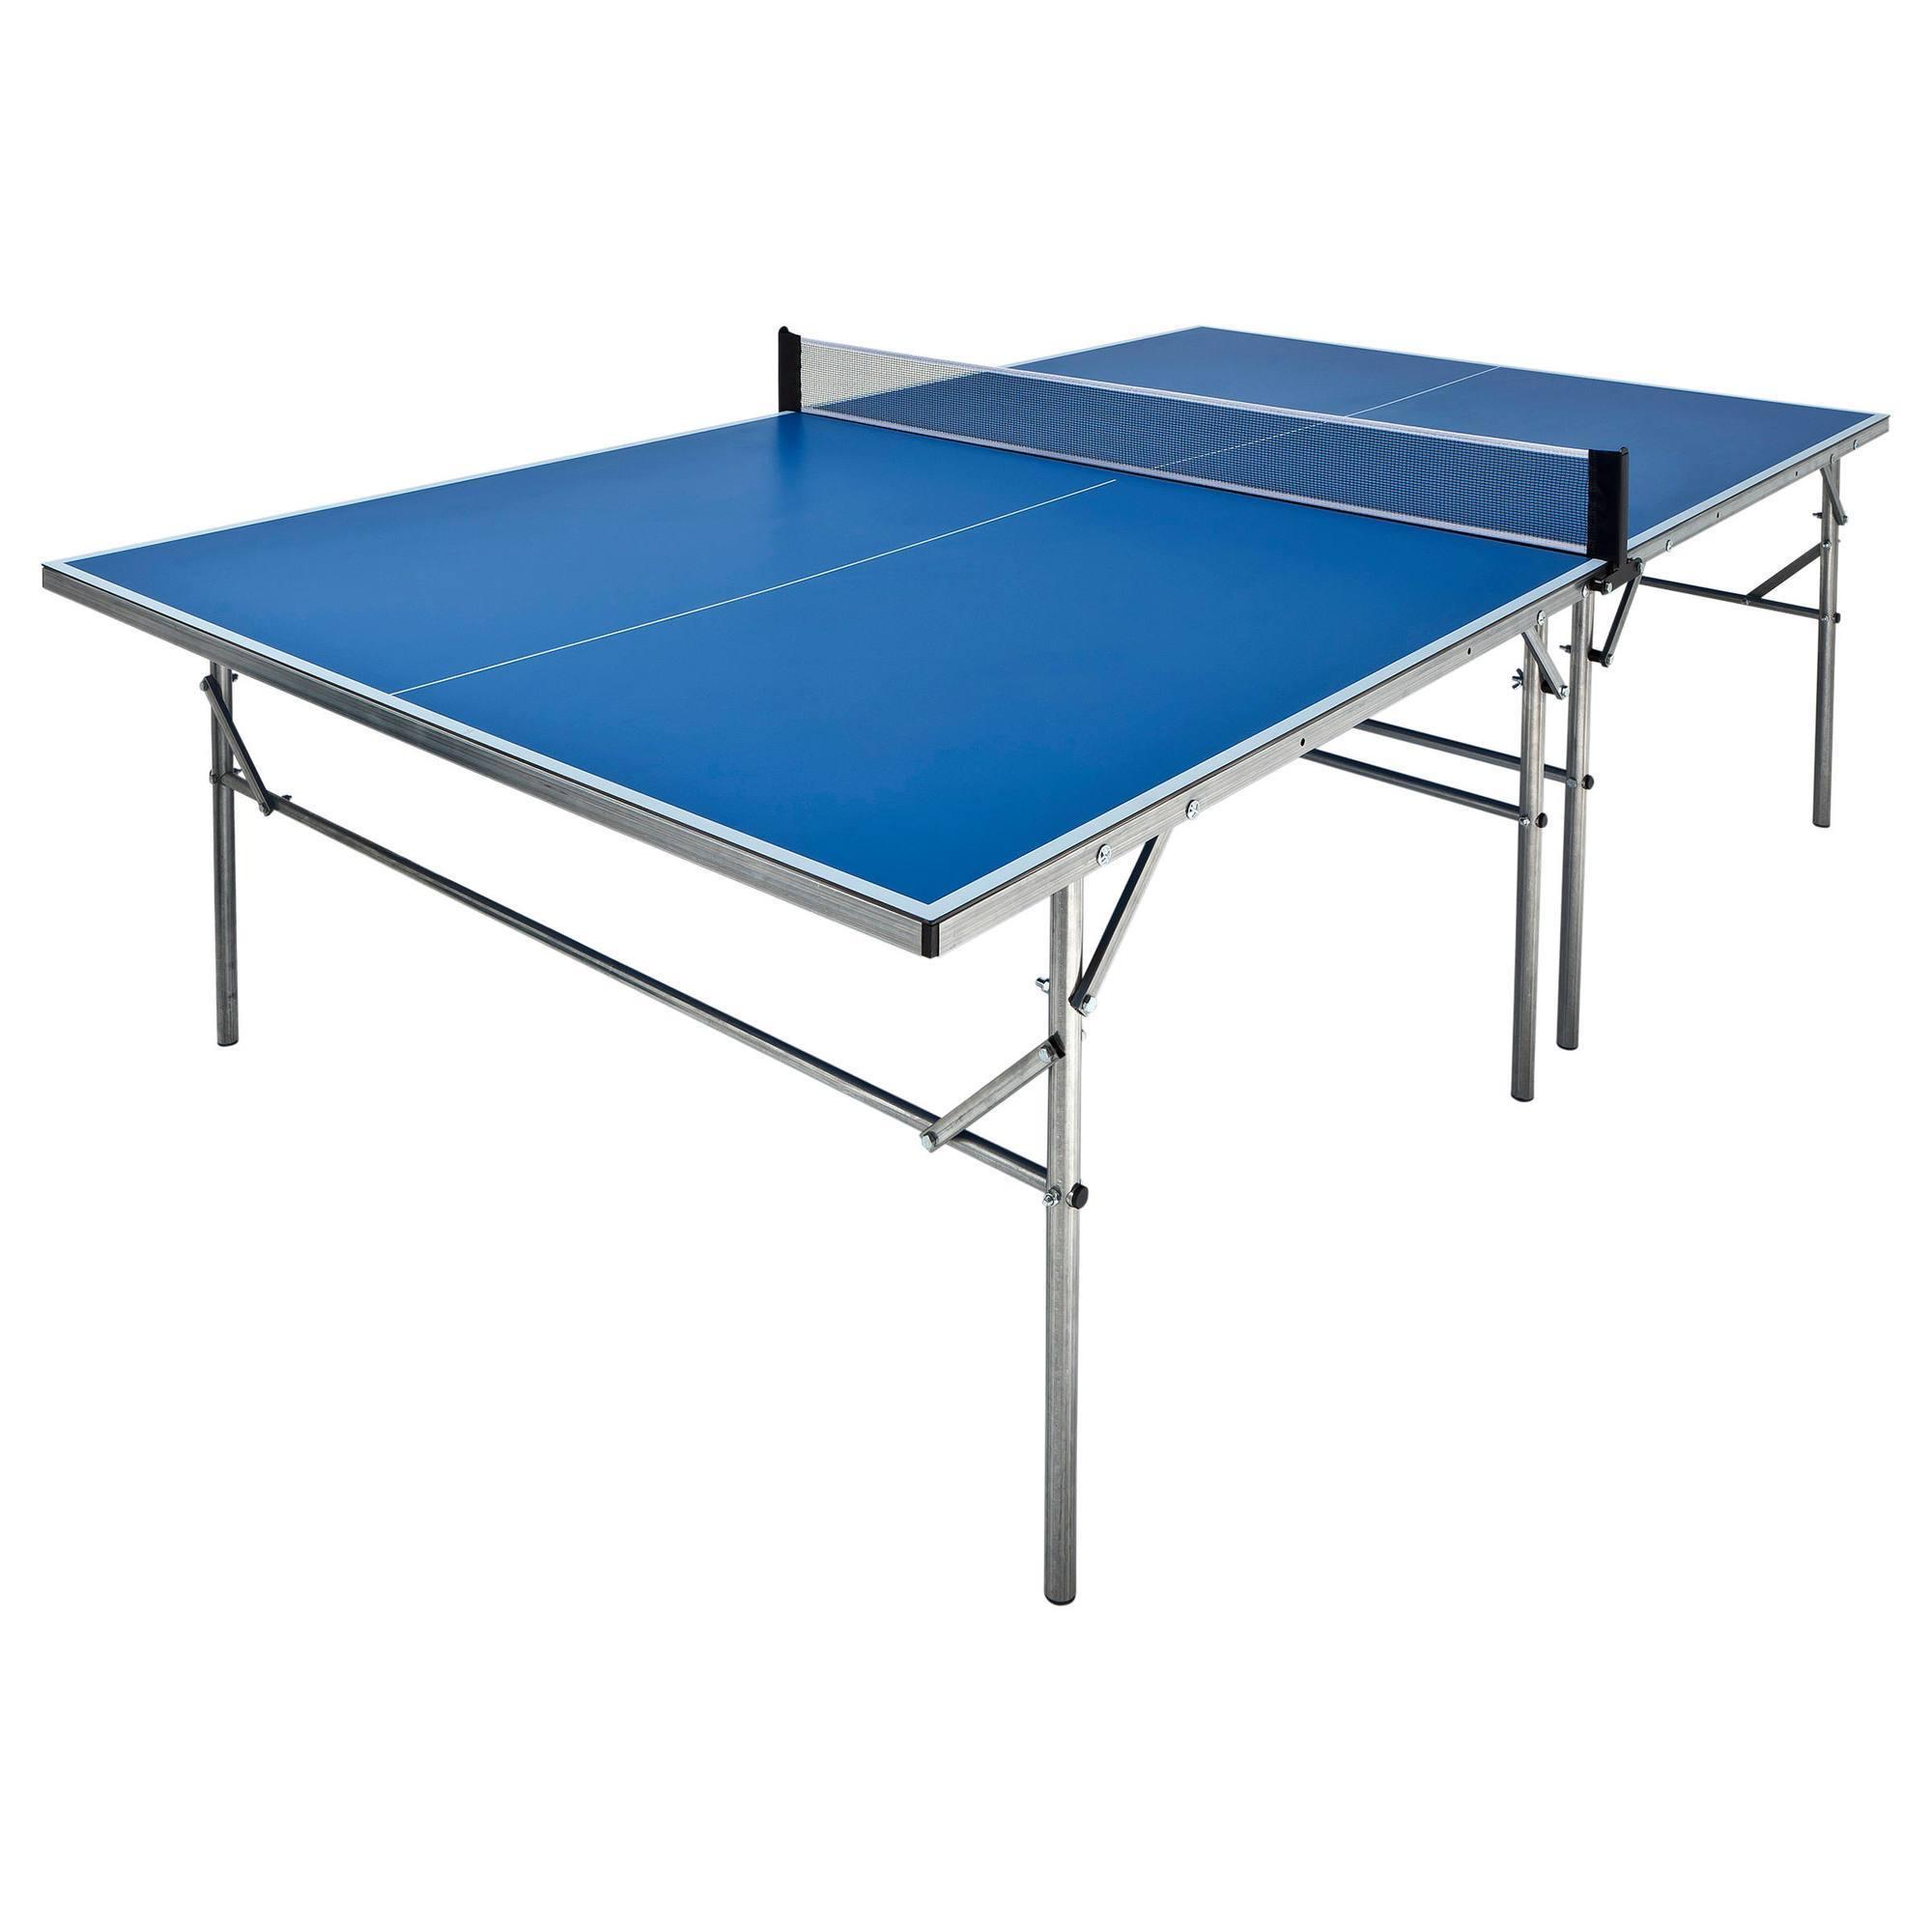 TABLE DE PING PONG EXTERIEUR FT720 BLEU